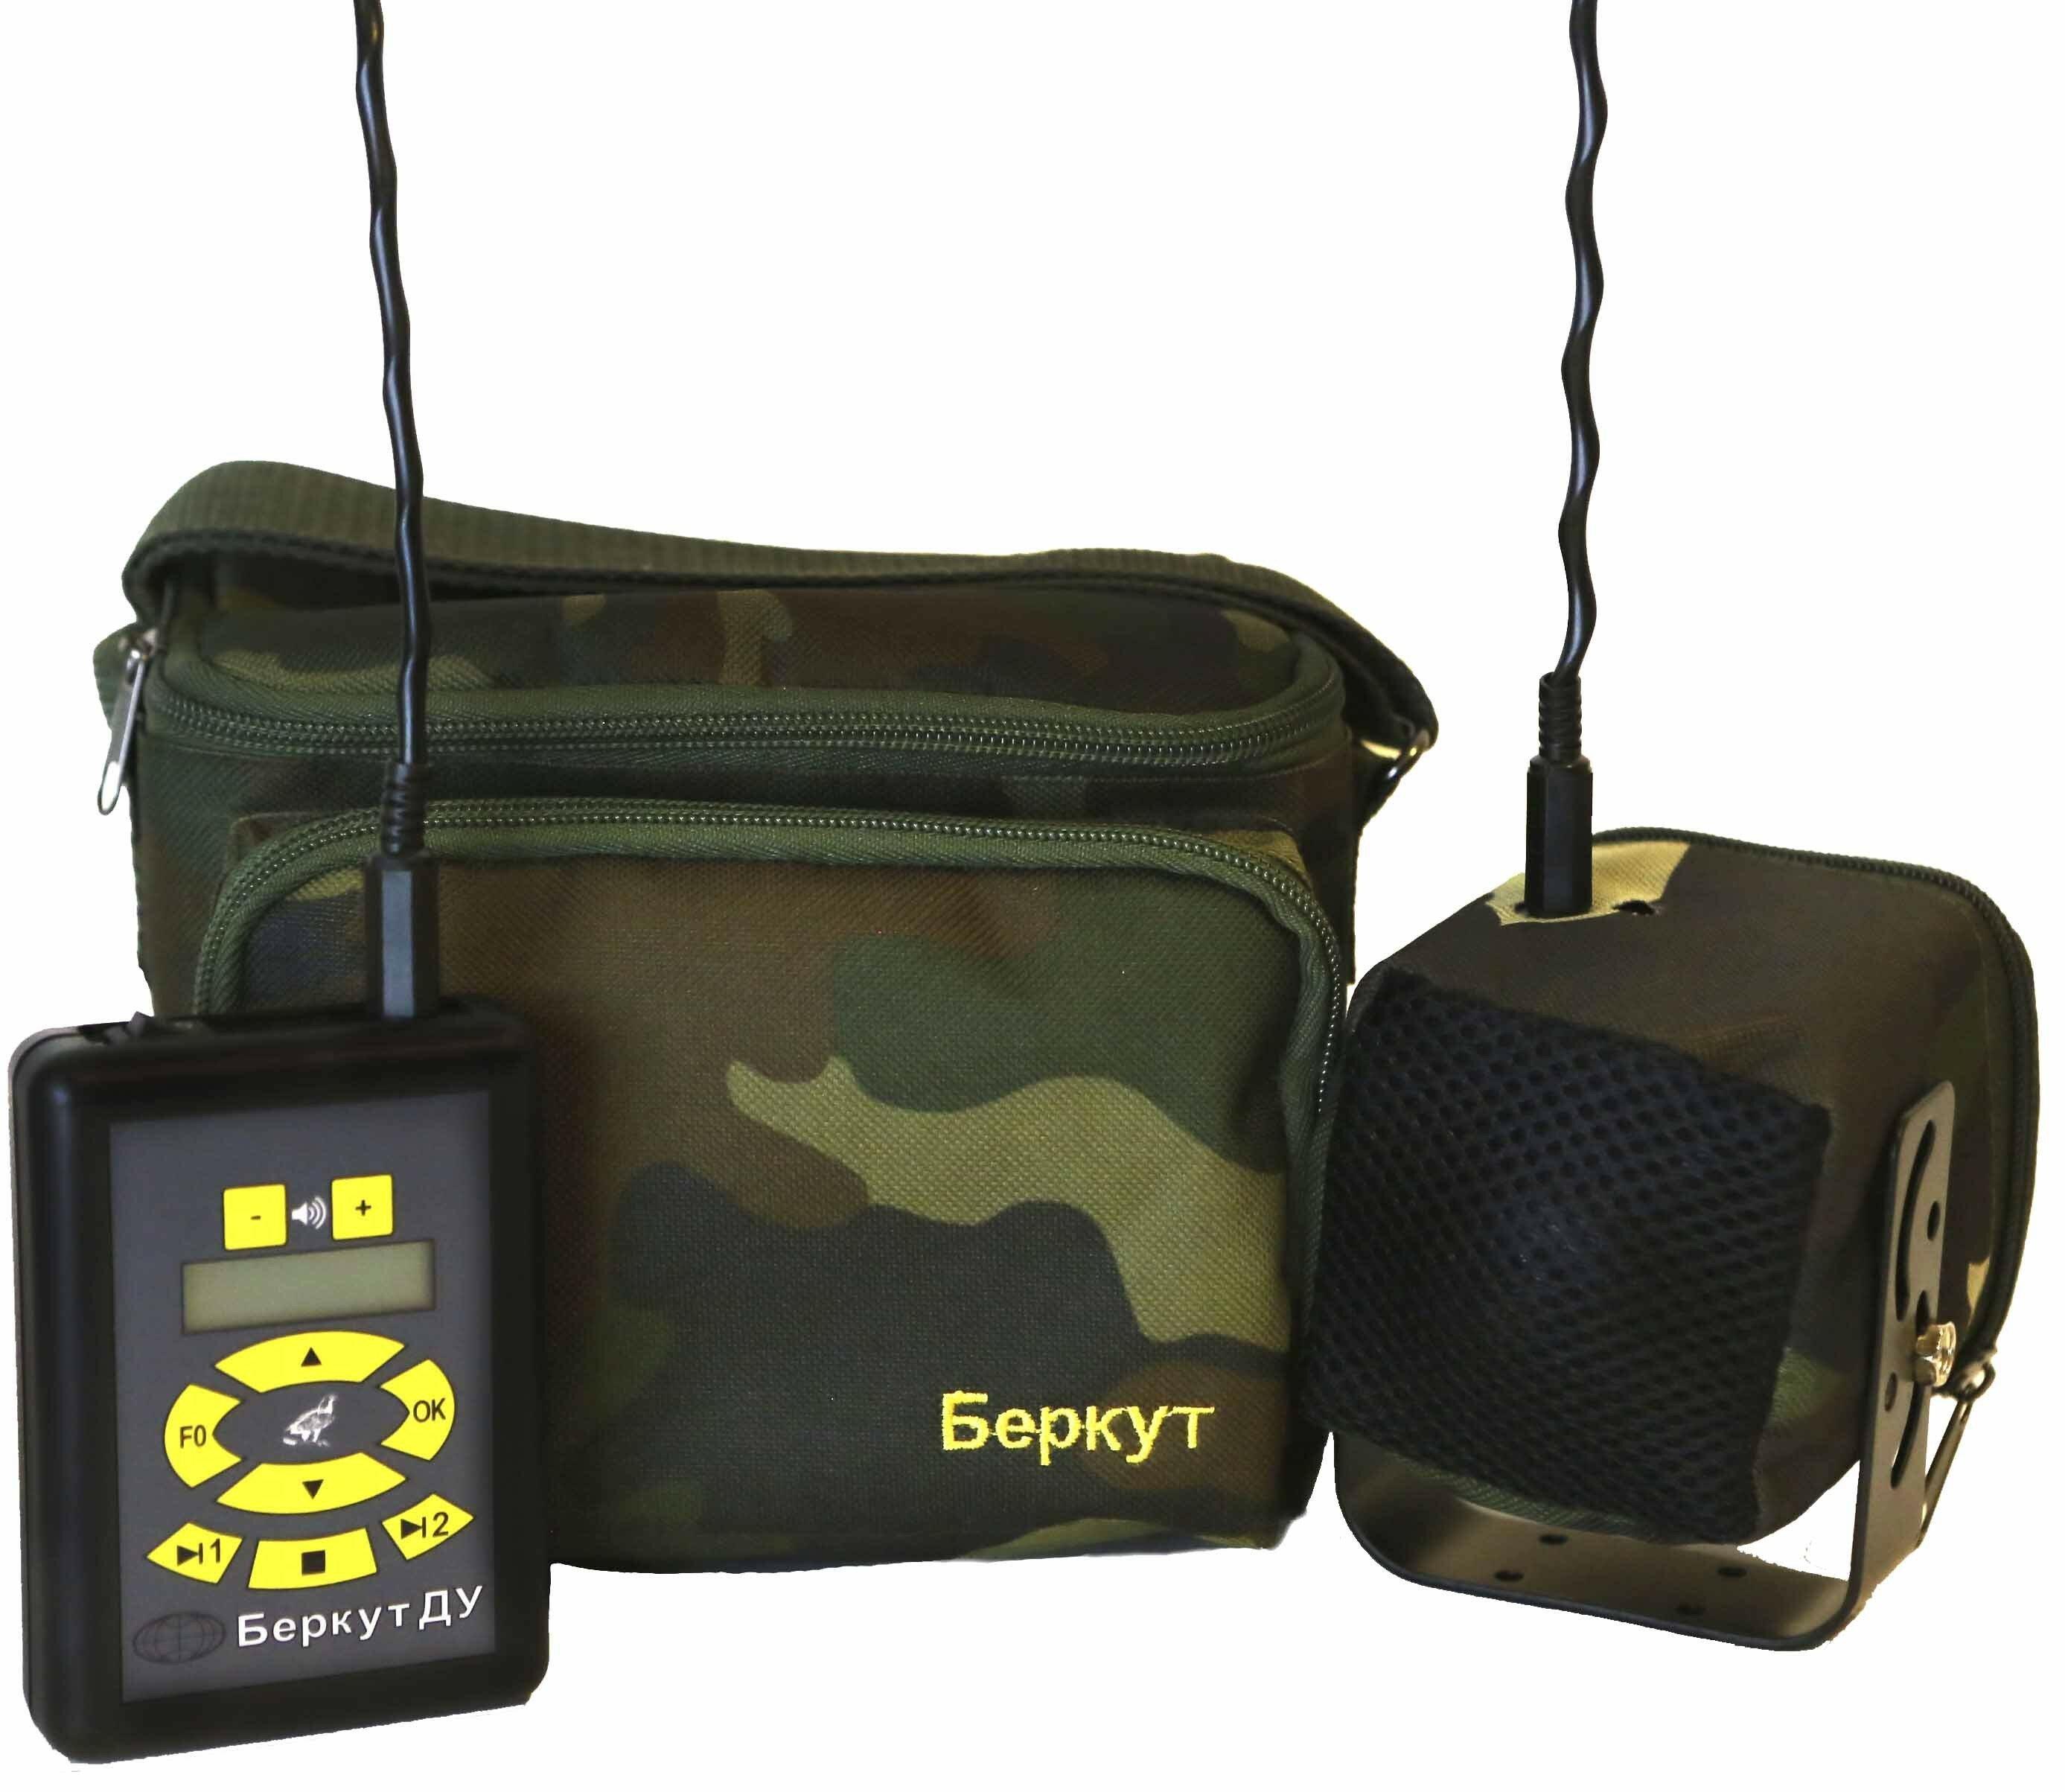 Электронный манок «Беркут ДУ» (электроманок для охоты)